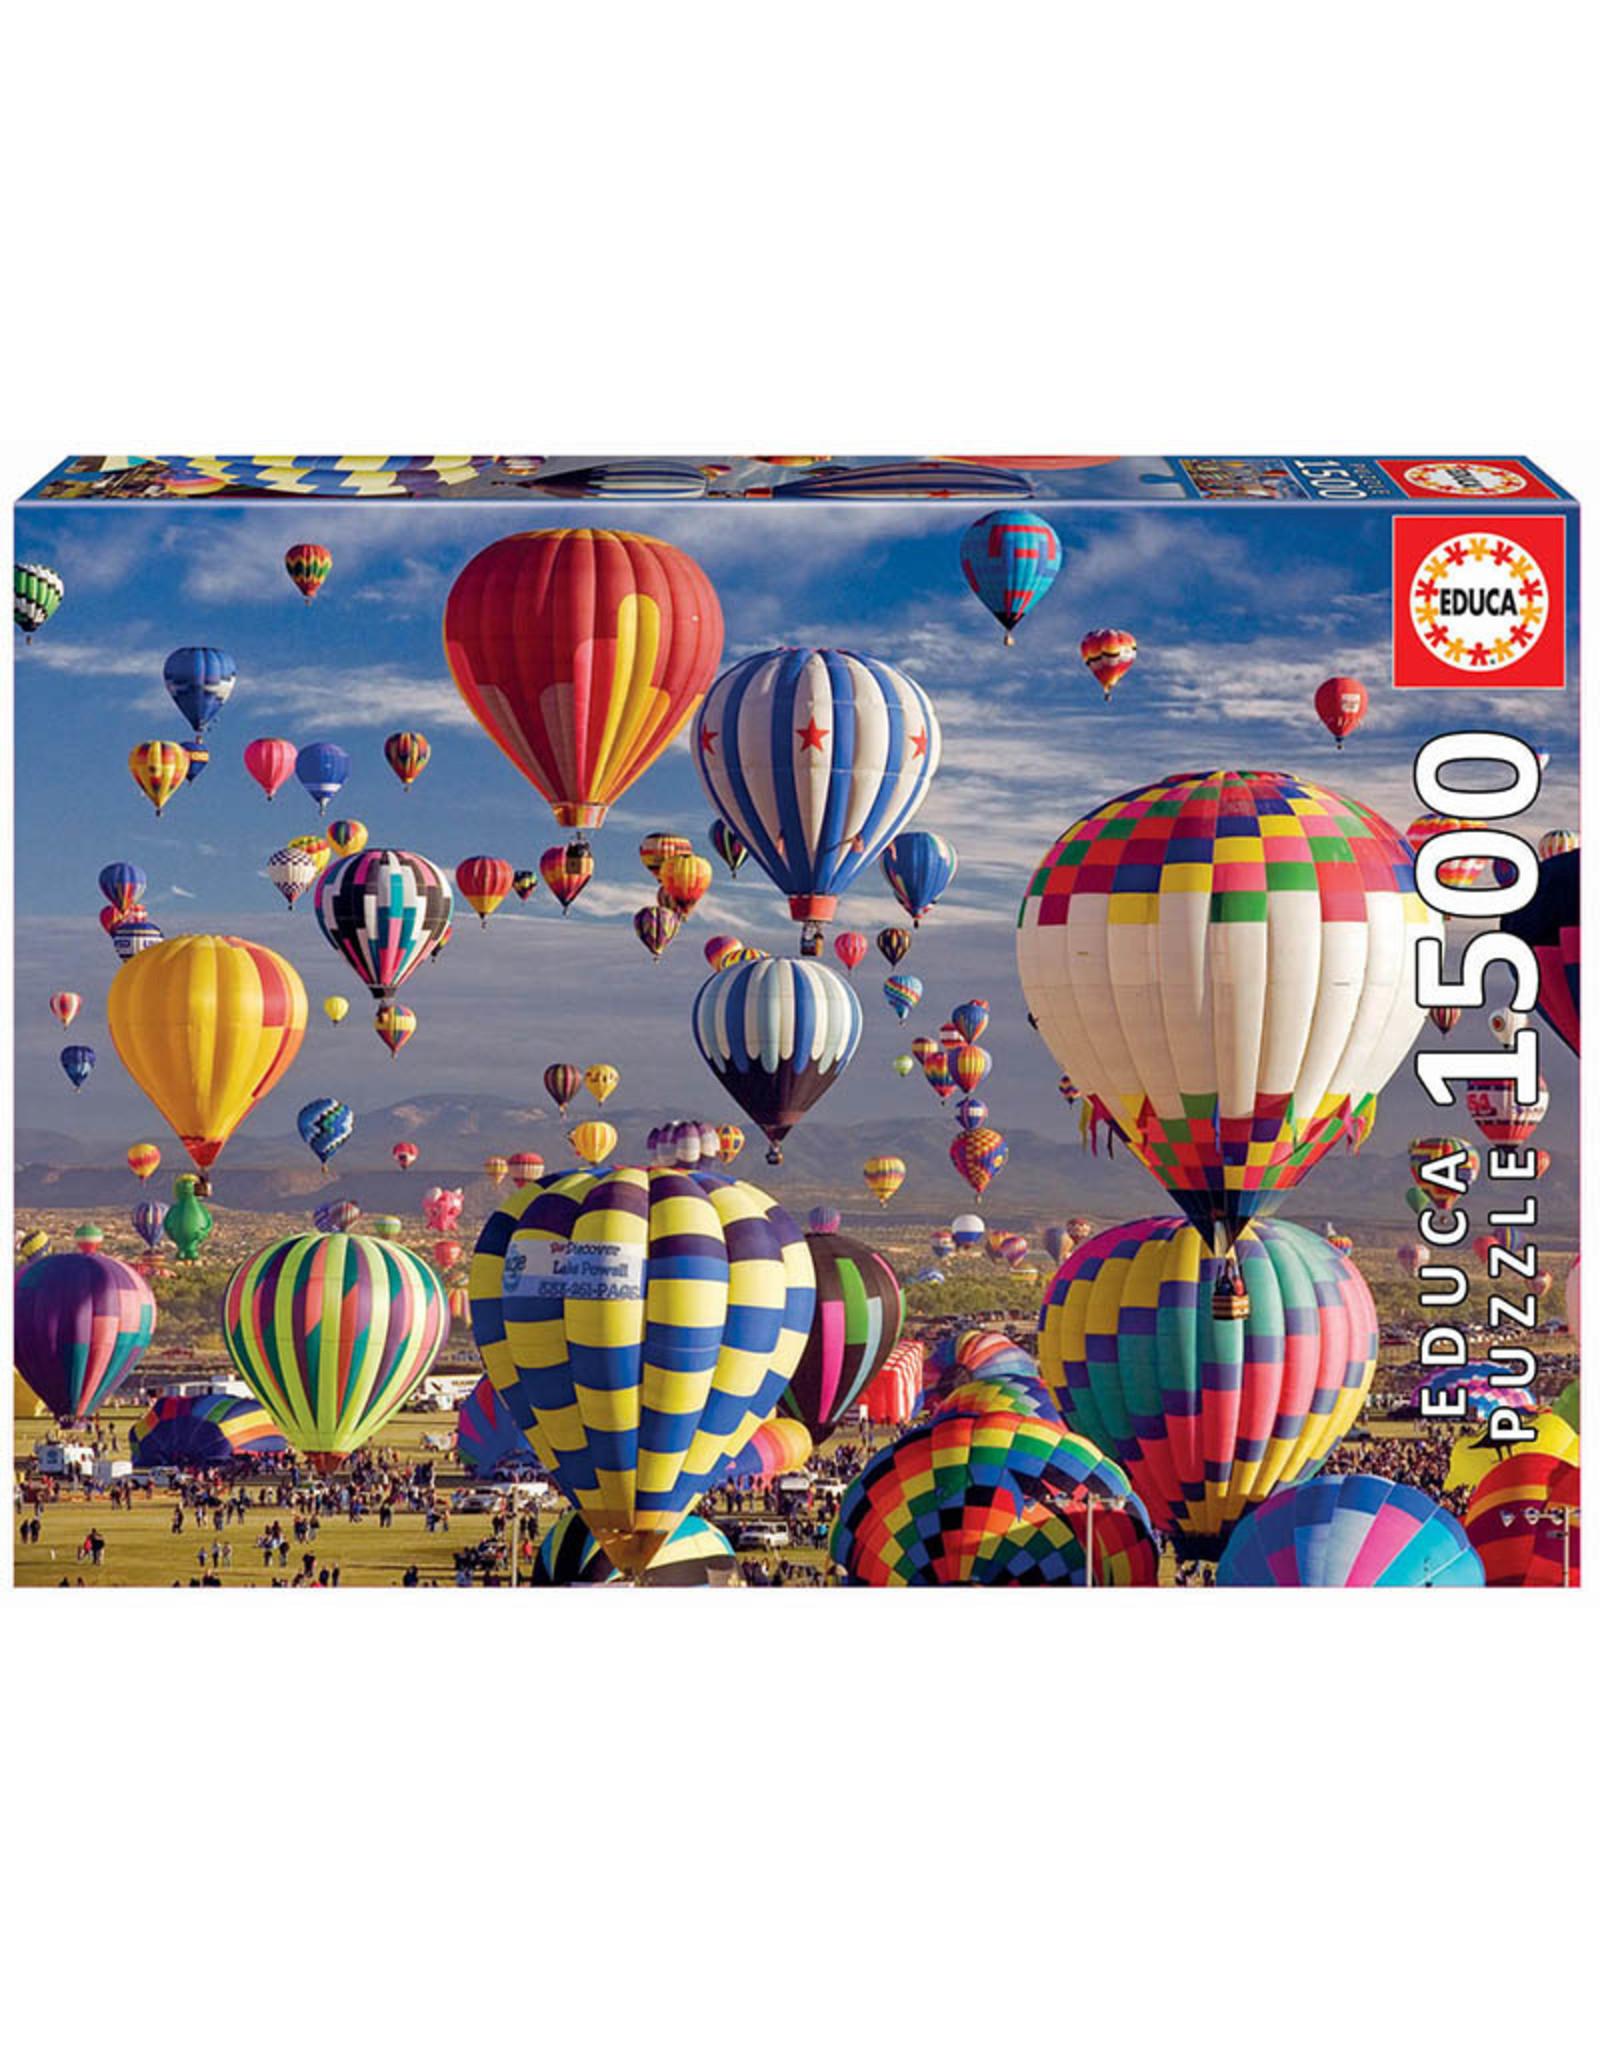 Educa Hot Air Balloons 1500pc Puzzle